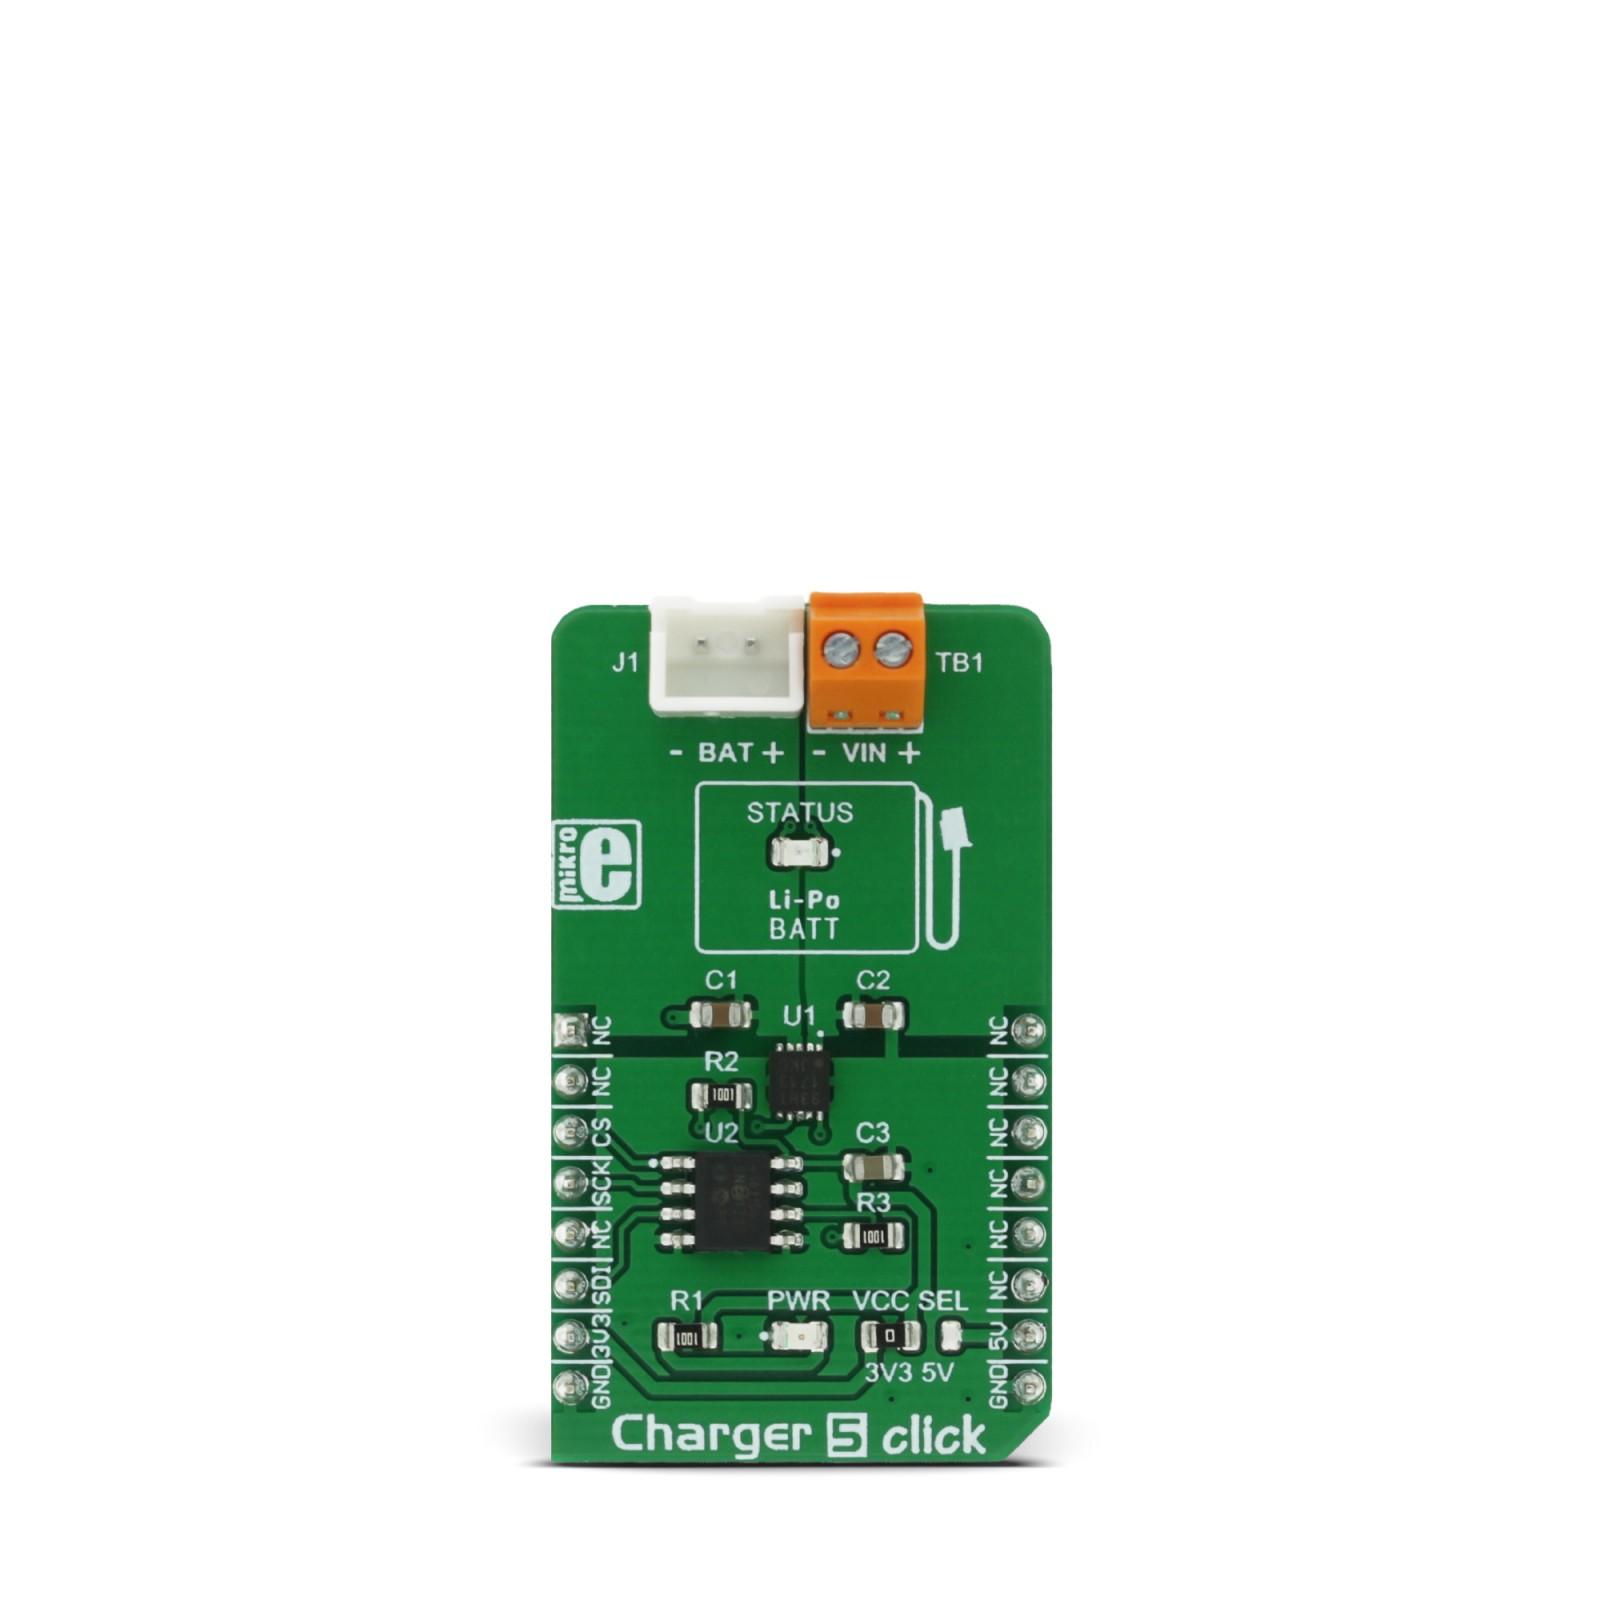 Charger 5 Click Mikroelektronika Simple Battery Circuit And Level Indicator Mgctlbxnmzp Mgctlbxv5112 Mgctlbxlc Mgctlbxpprestashop